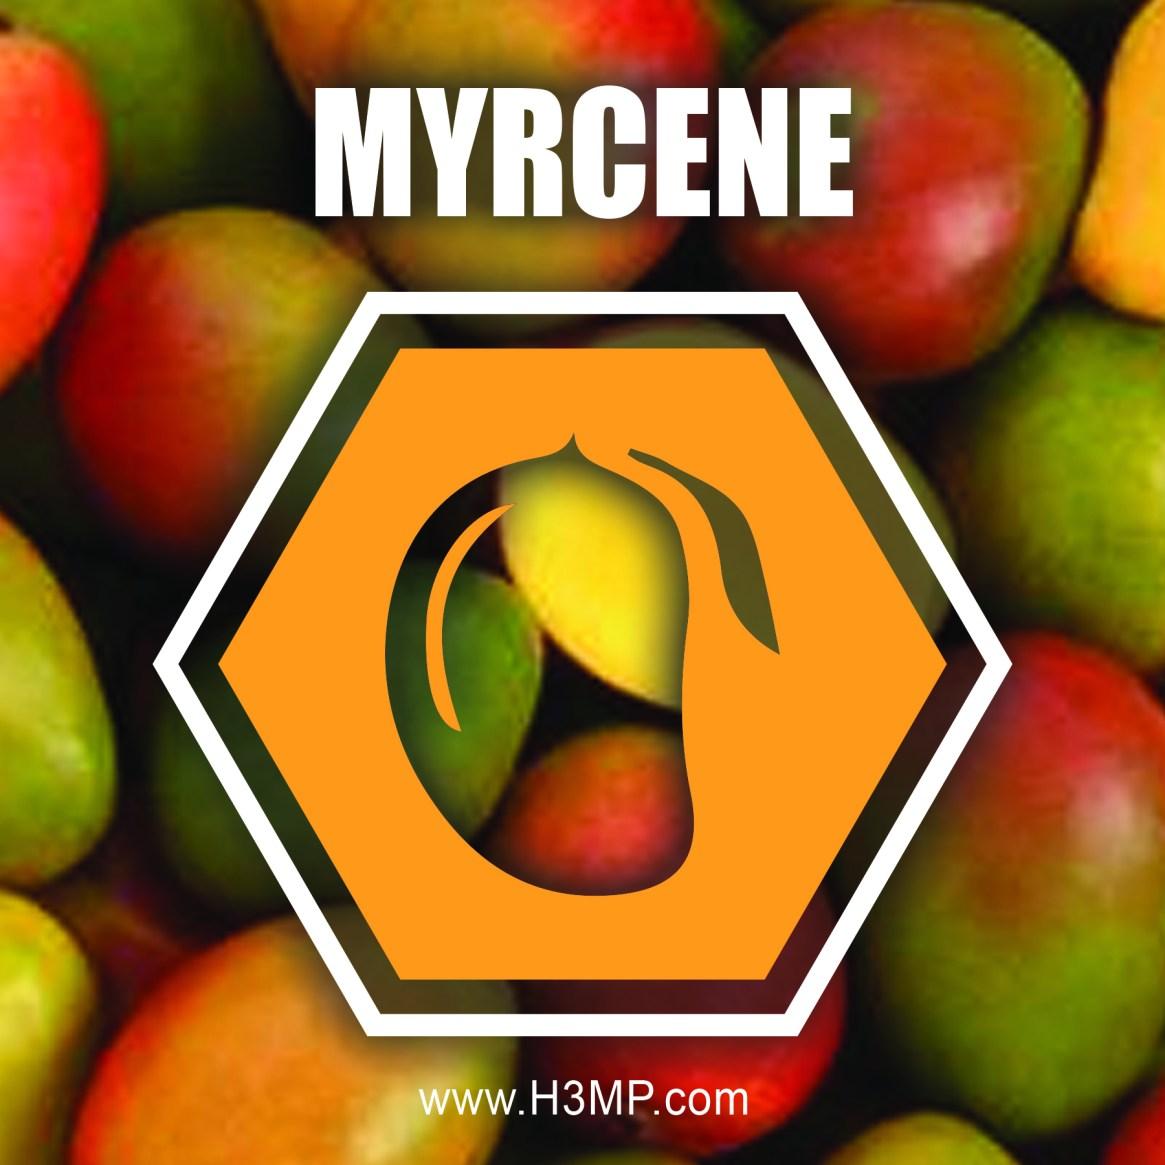 H3MP MYRCENE